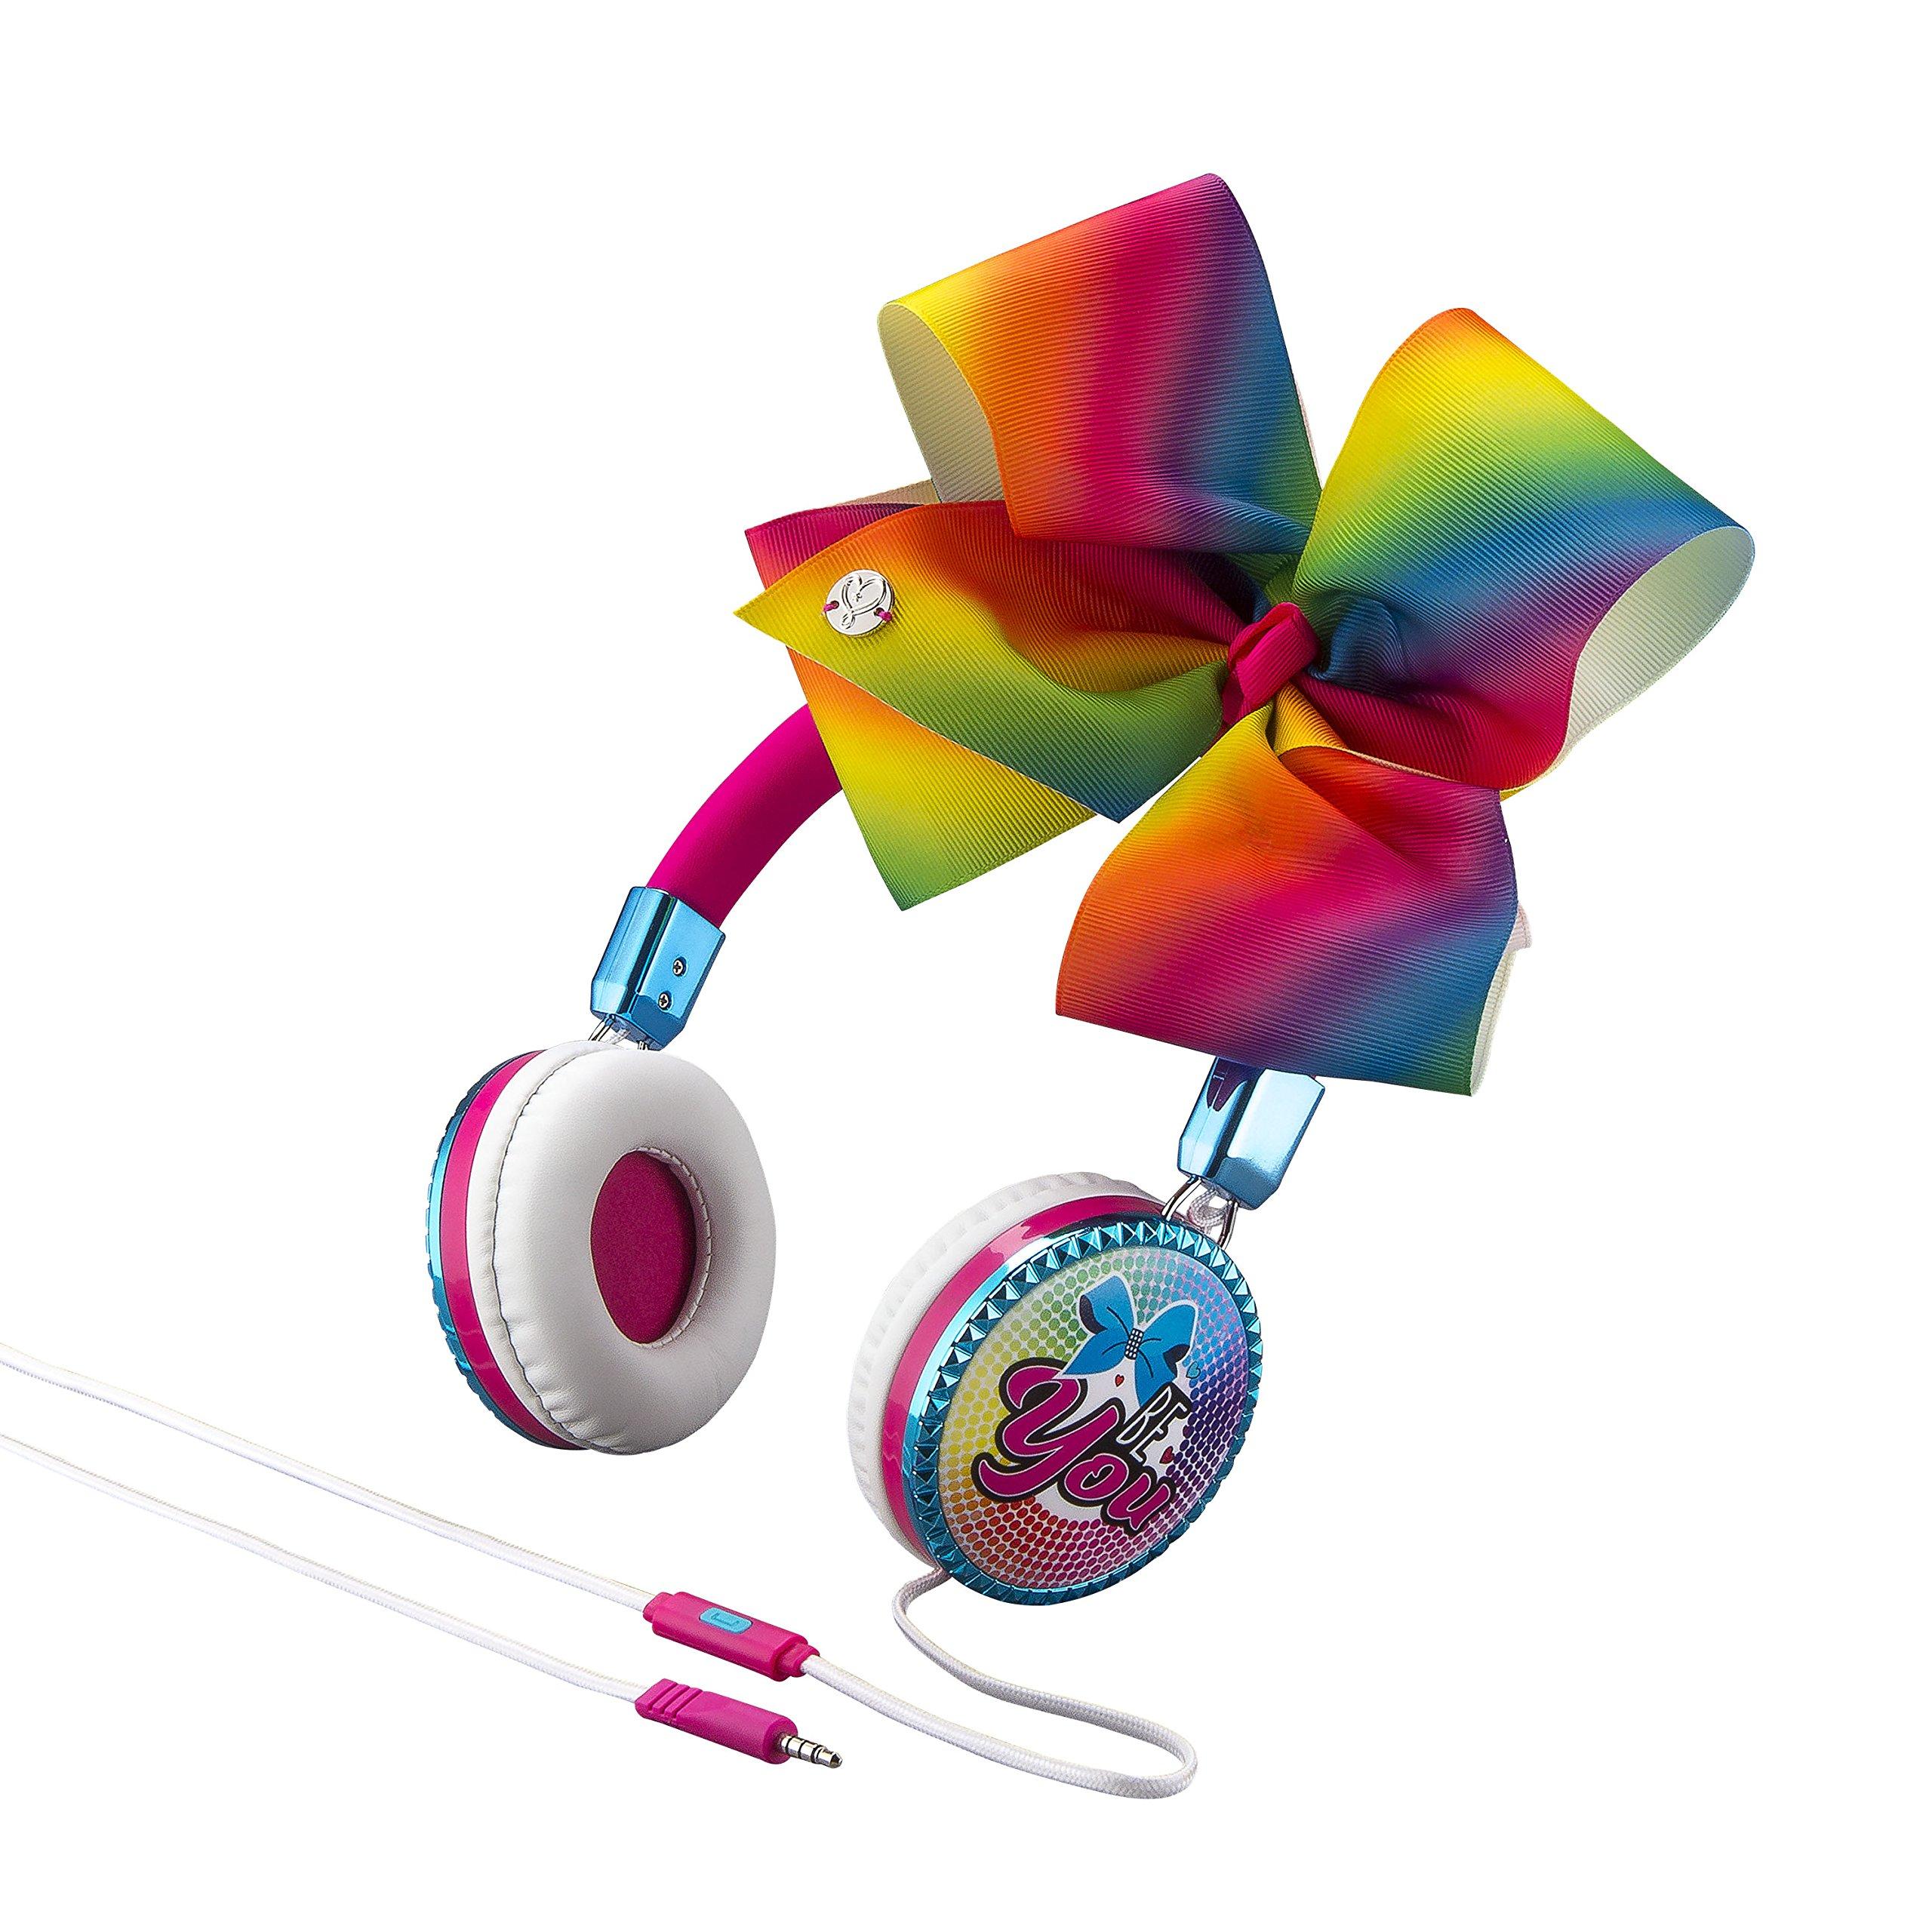 JoJo Siwa Bow Fashion Headphones with built in Microphone by eKids